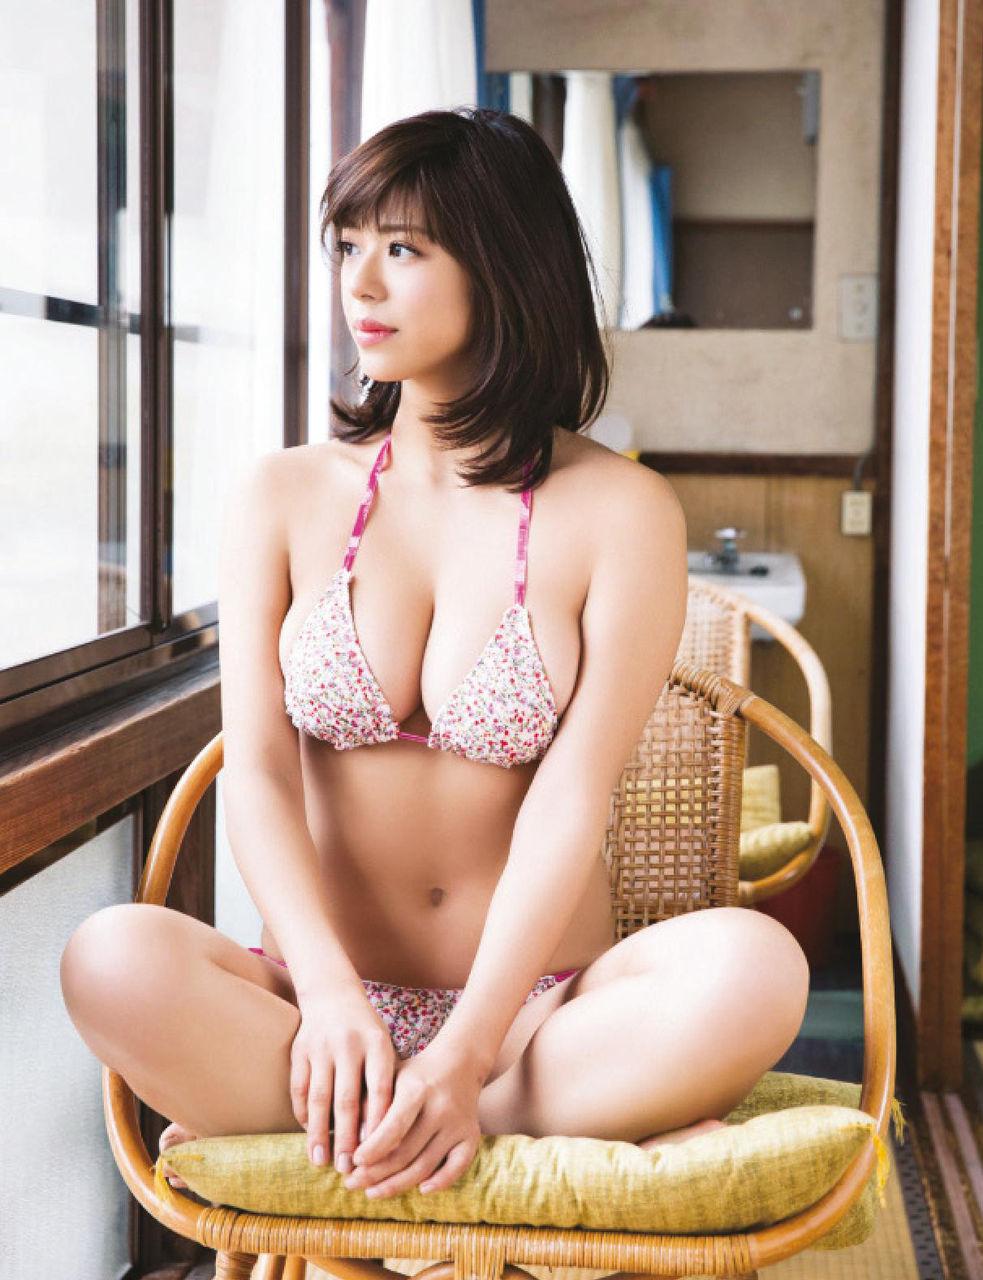 Minami Wachi わちみなみ Photos